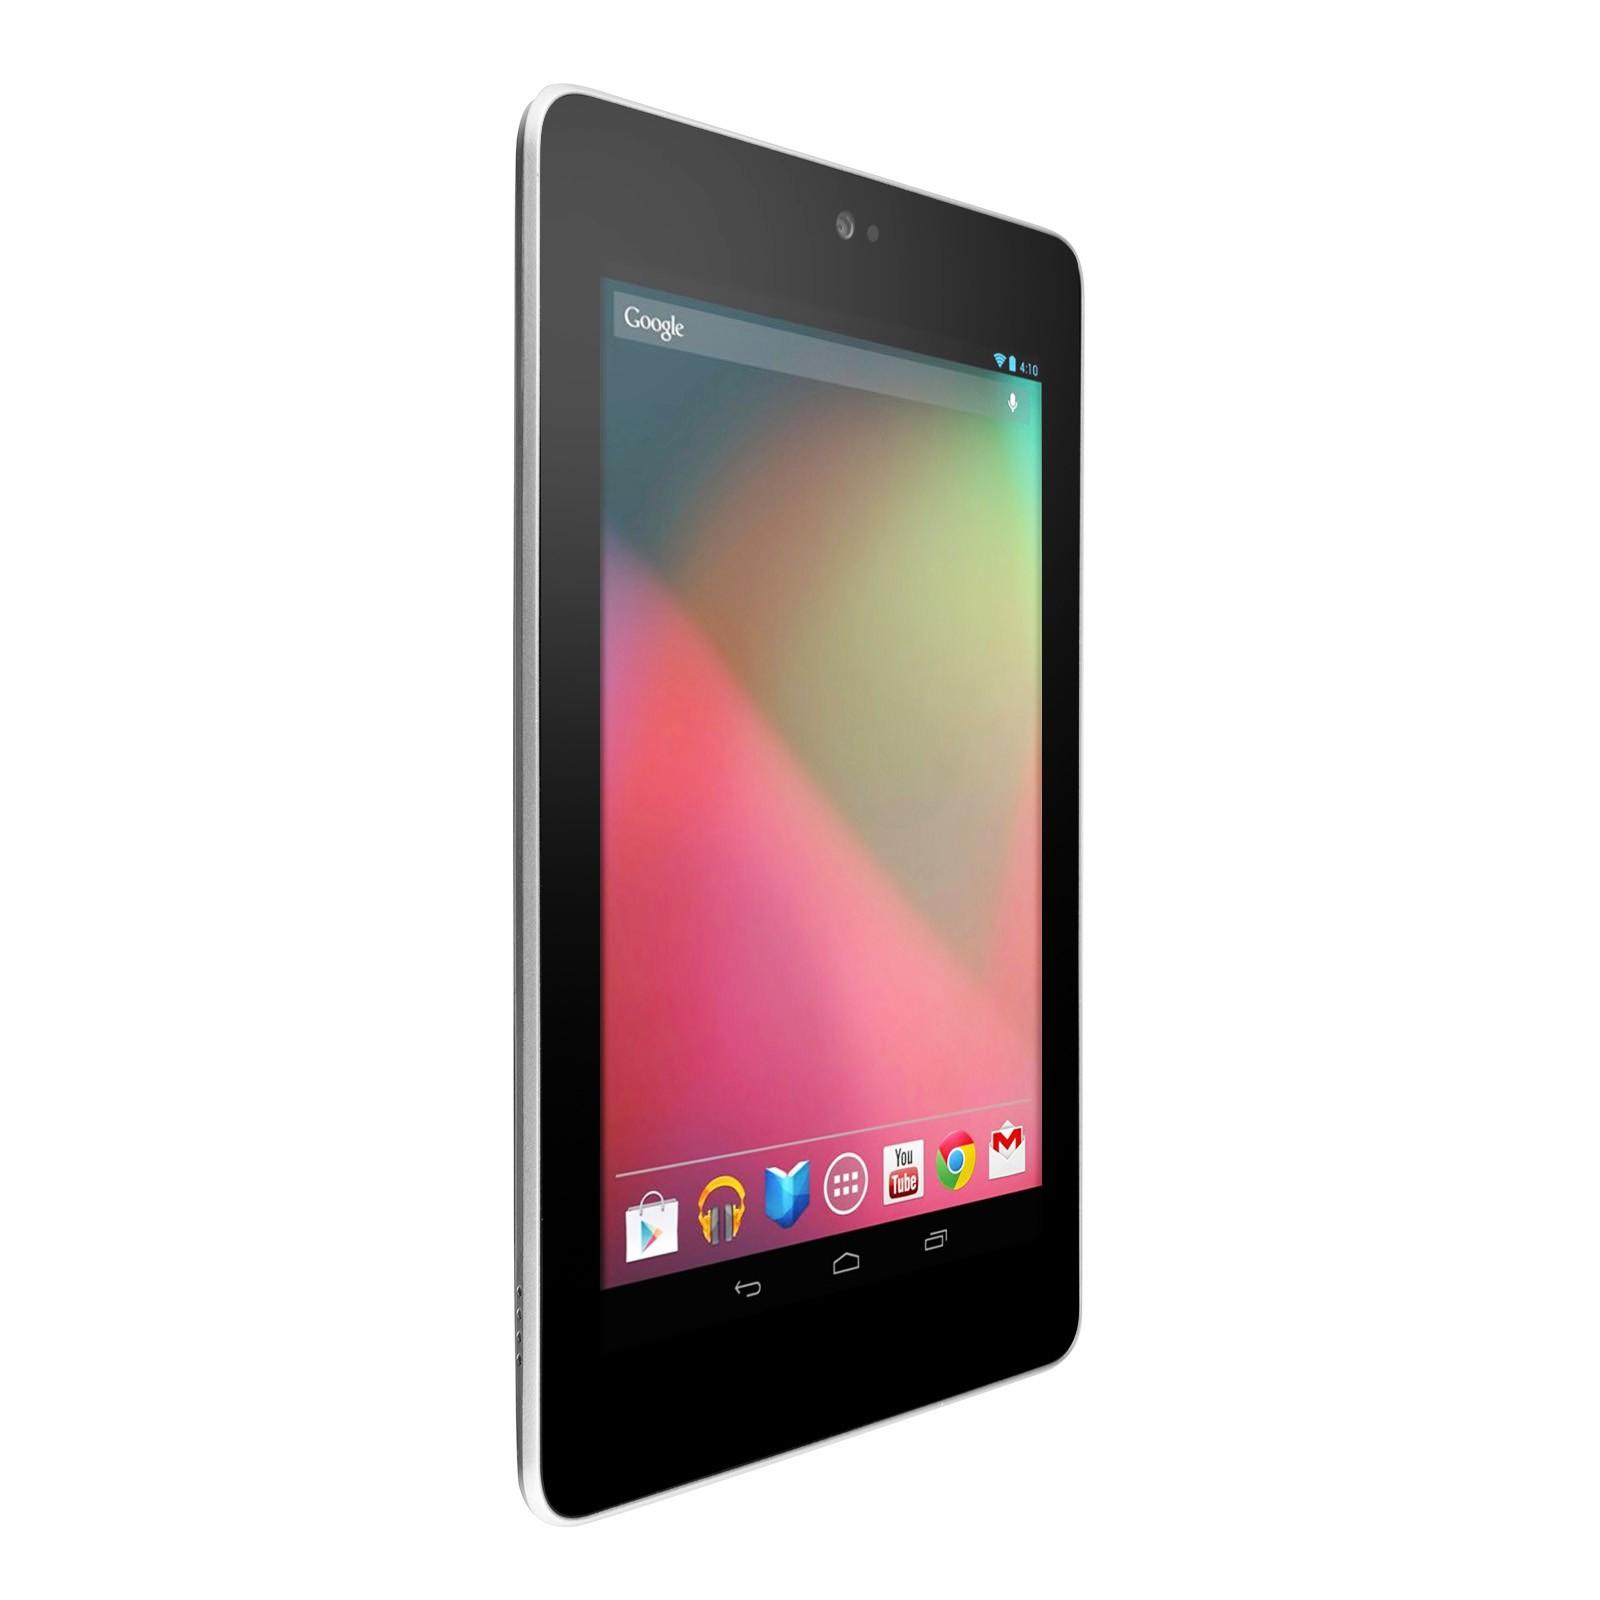 "Asus 7"" Google Nexus 7 Android Tablet (16GB Memory, 1.2 ..."